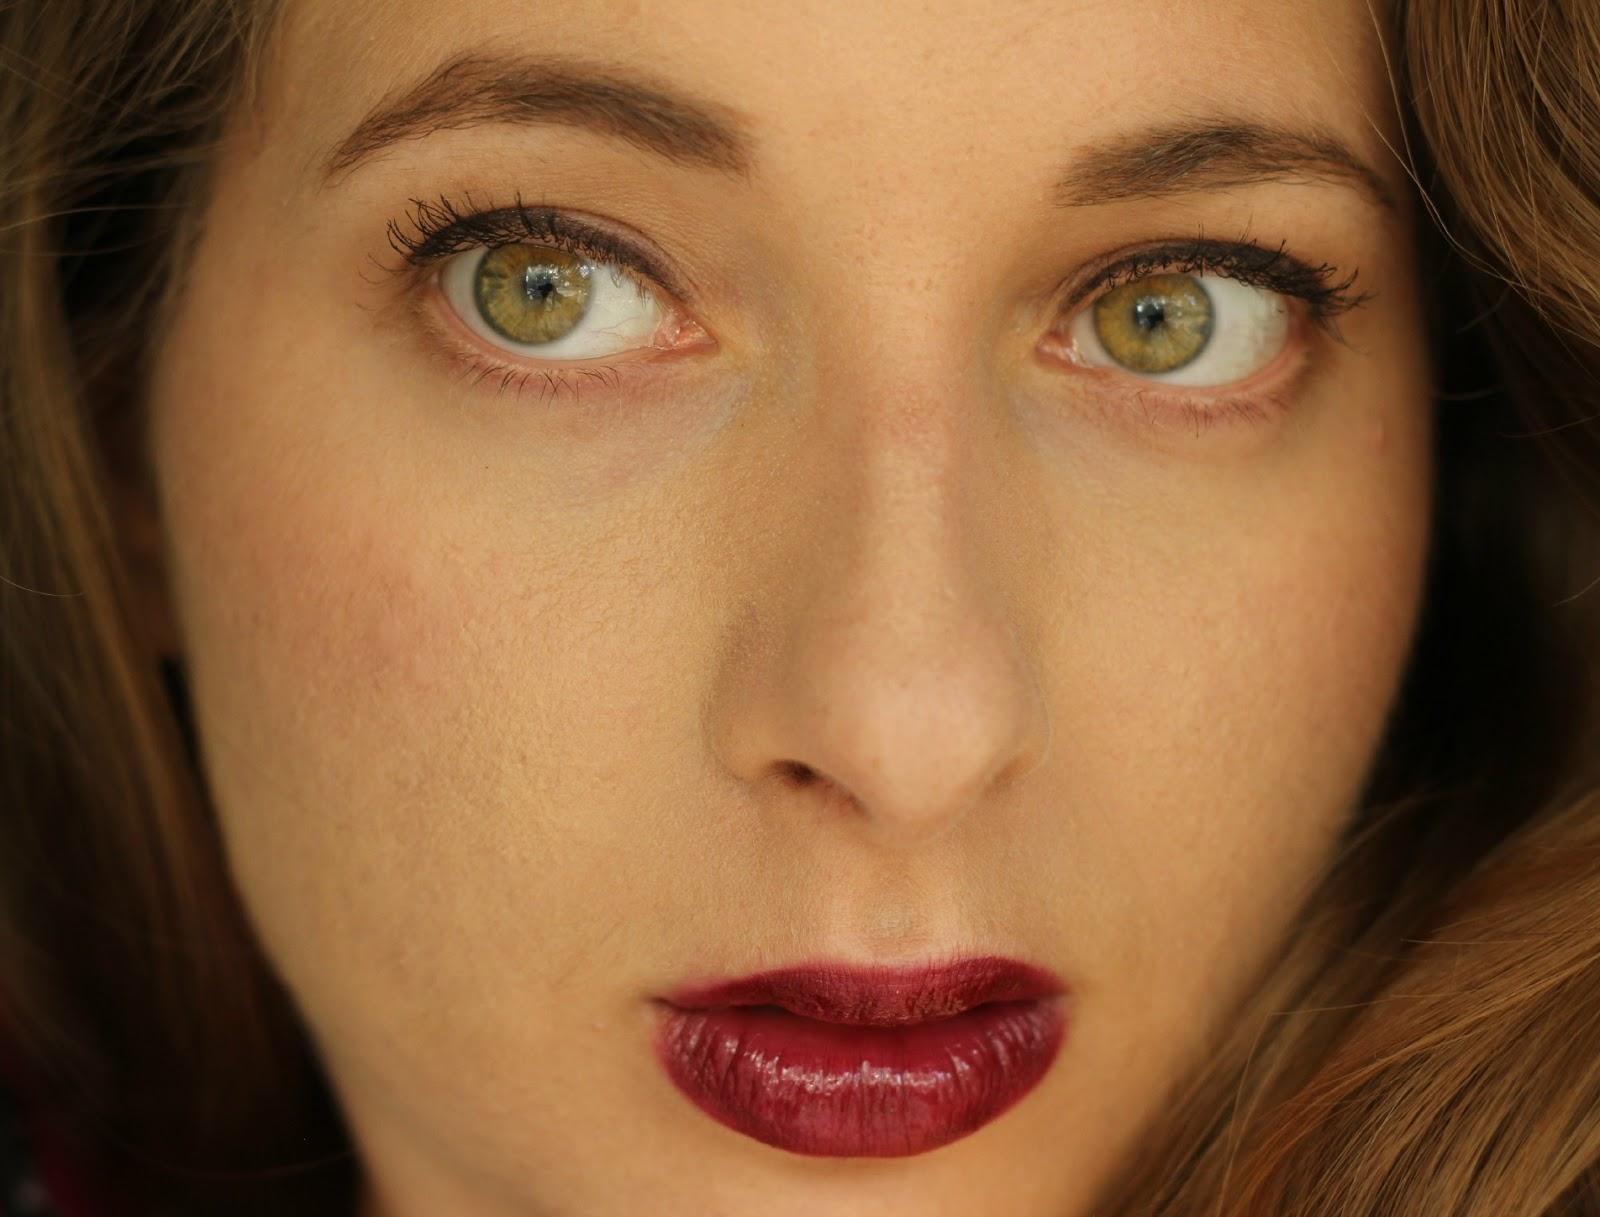 Lipstick over lips